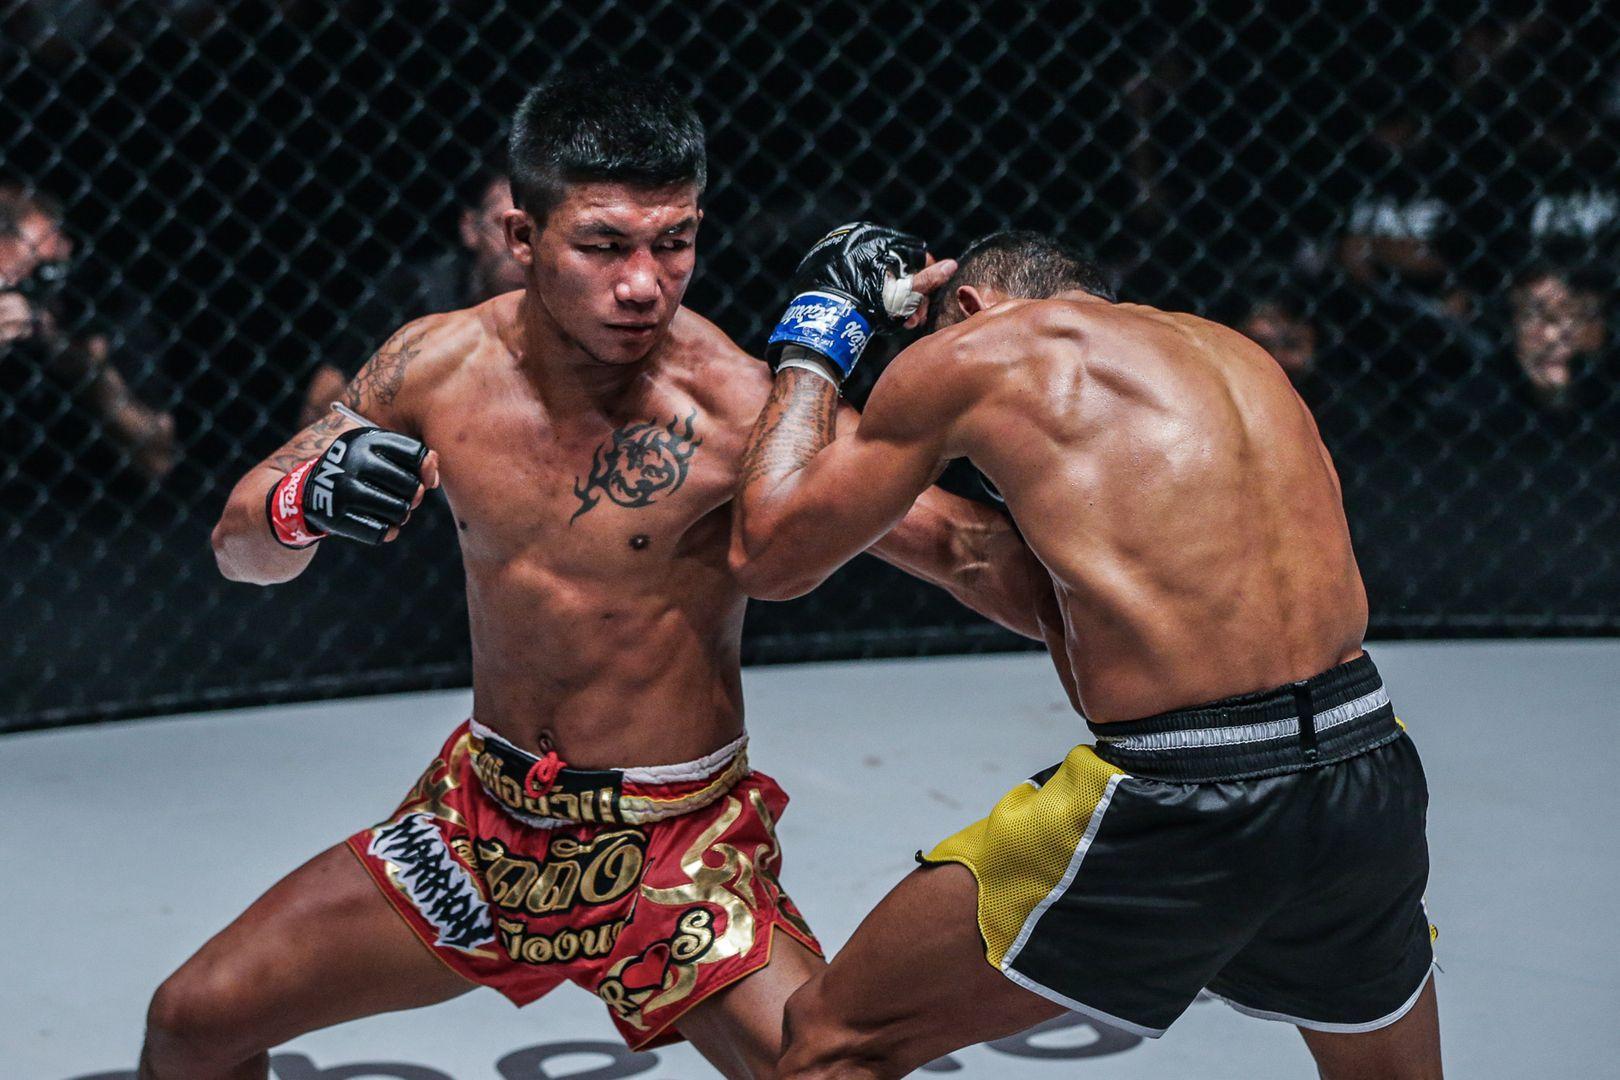 ONE Flyweight Muay Thai World Champion Rodtang Jitmuangnon winds up for a cross